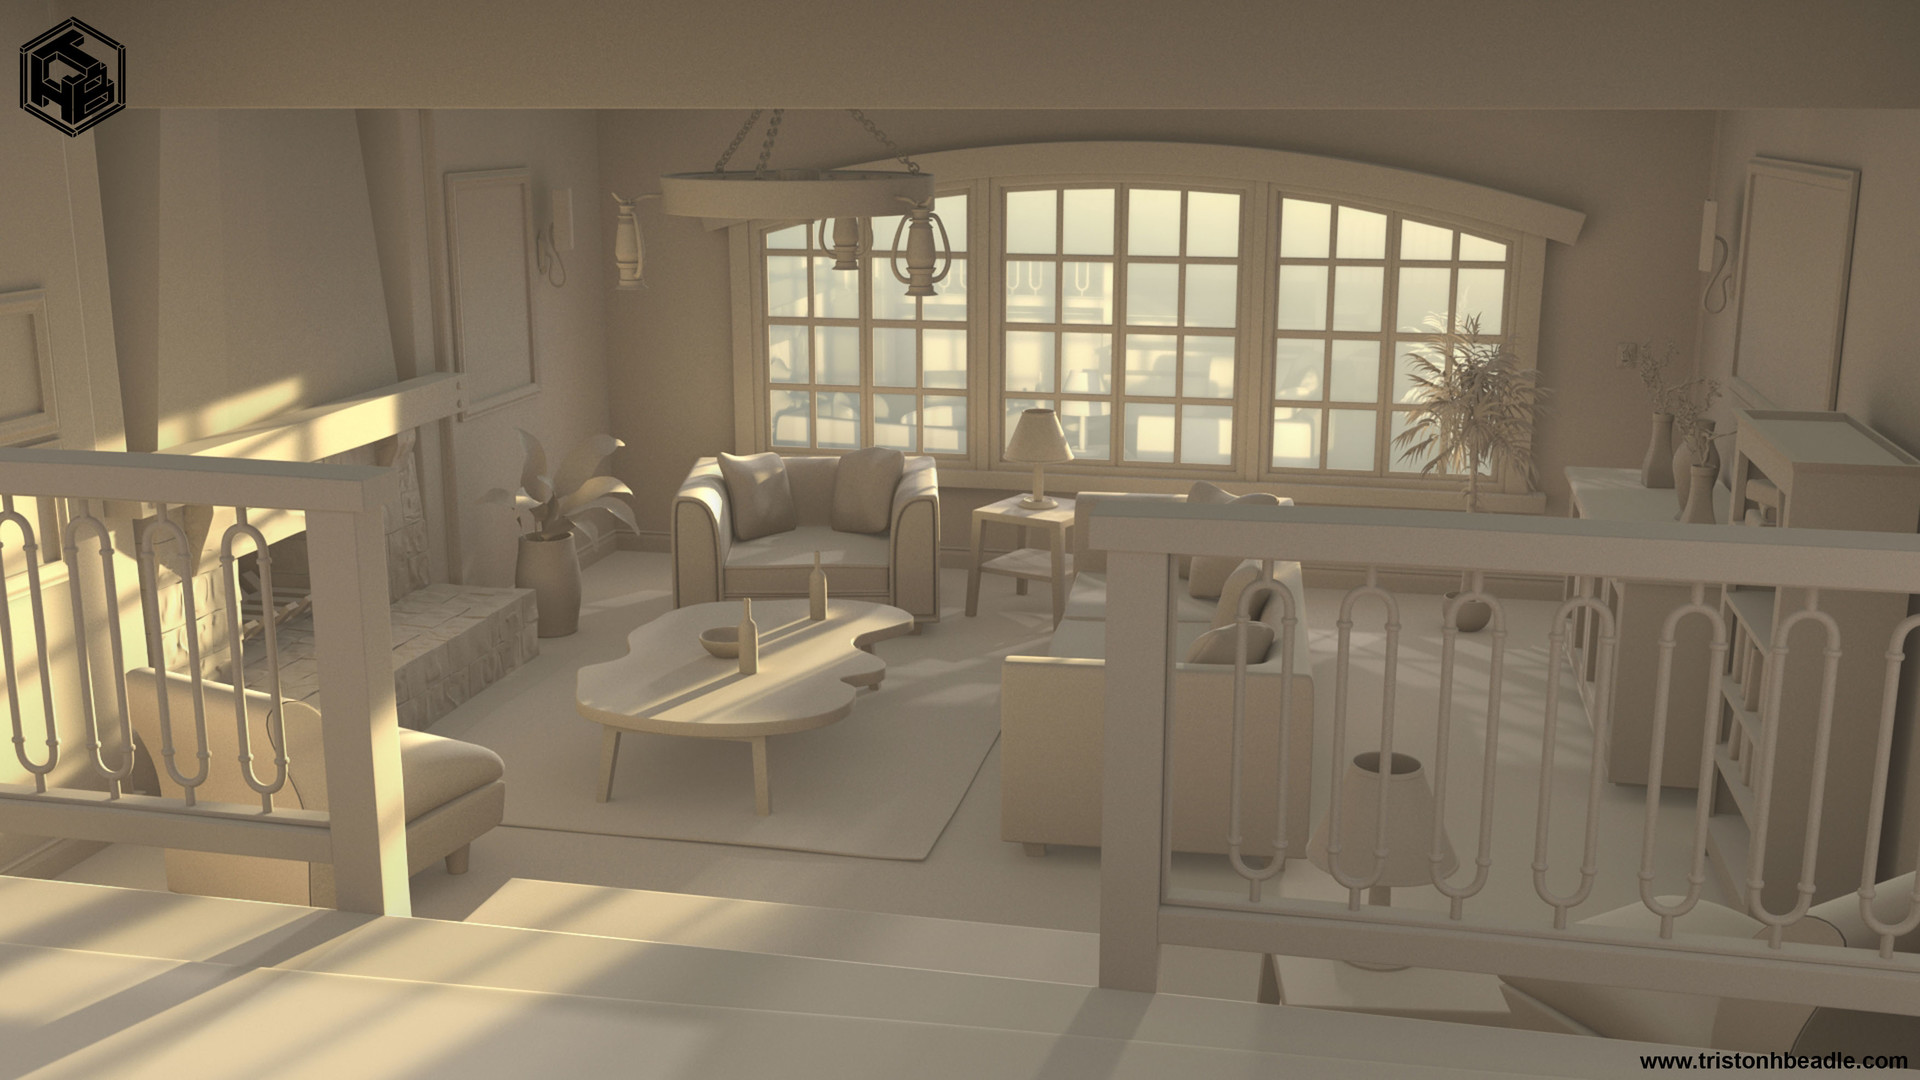 Triston beadle interior sitting room